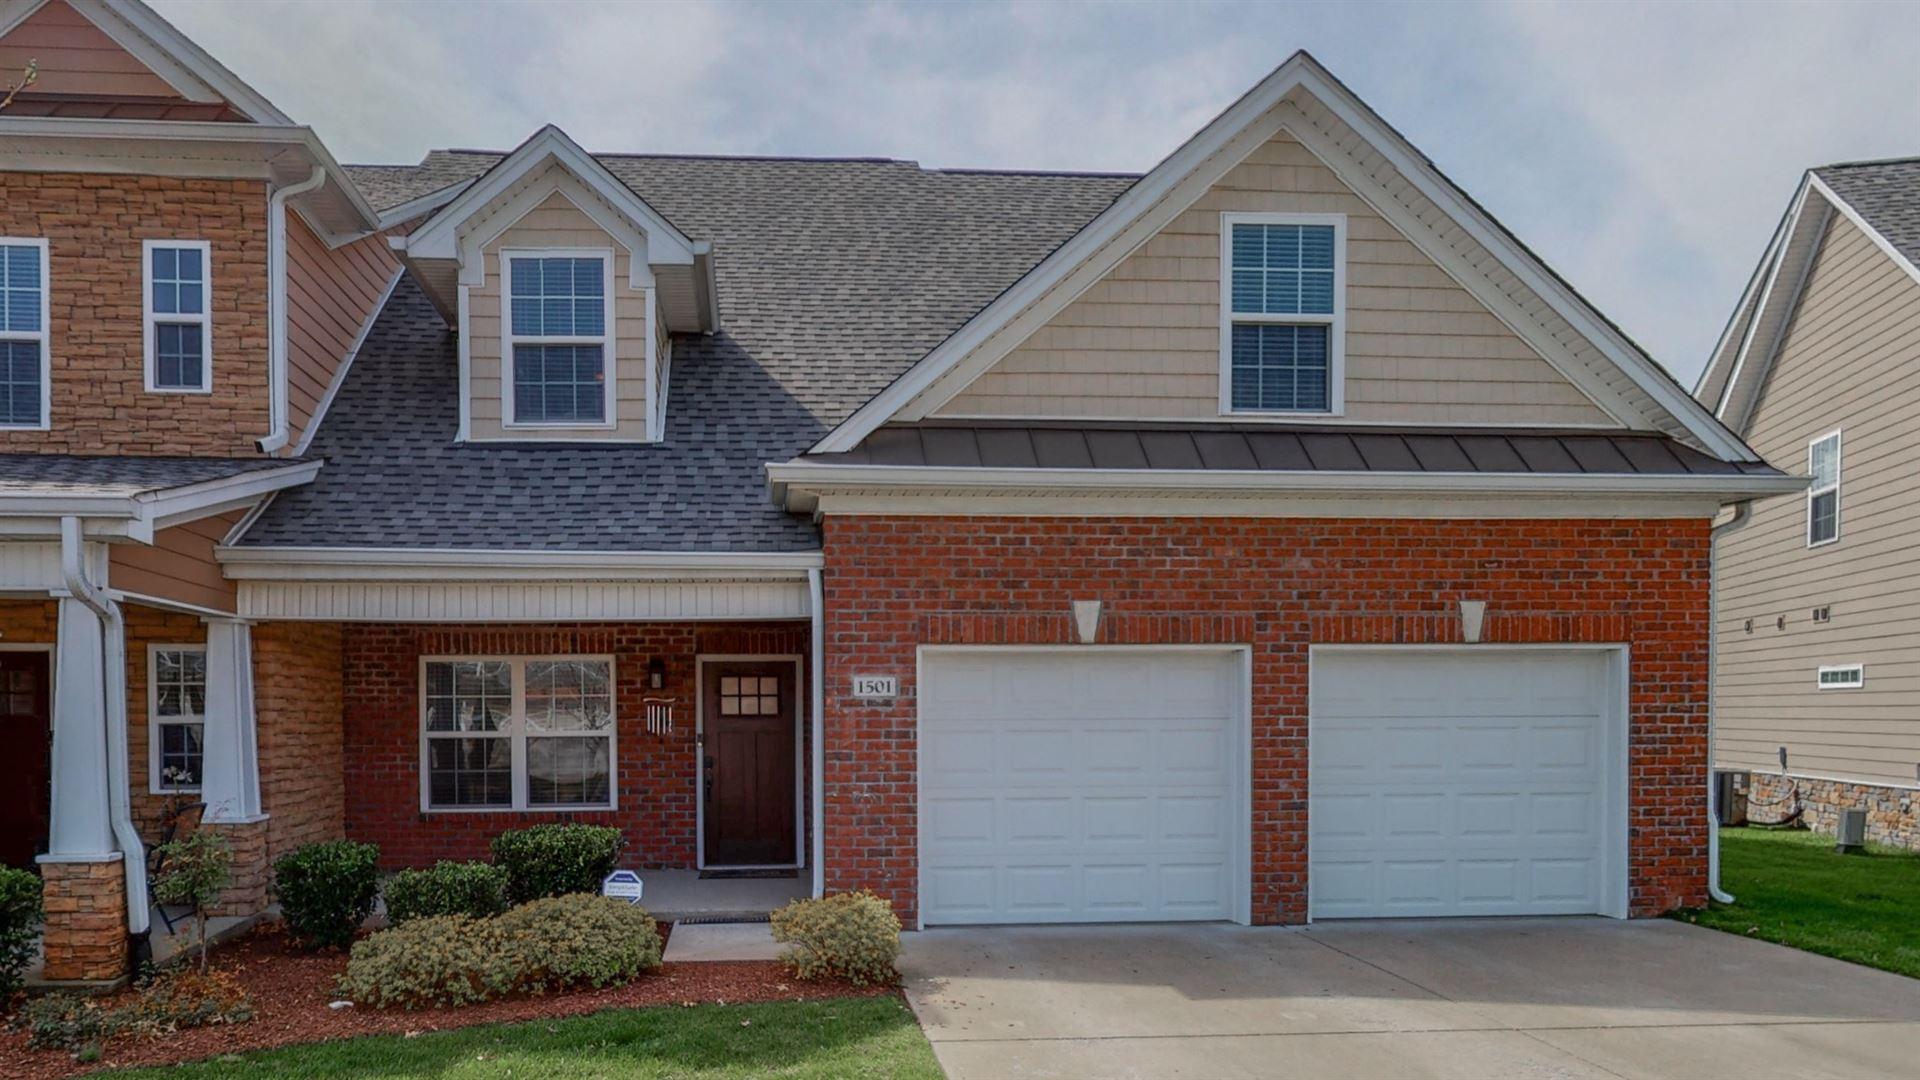 Photo of 2342 North Tennessee Blvd #1501, Murfreesboro, TN 37130 (MLS # 2242739)